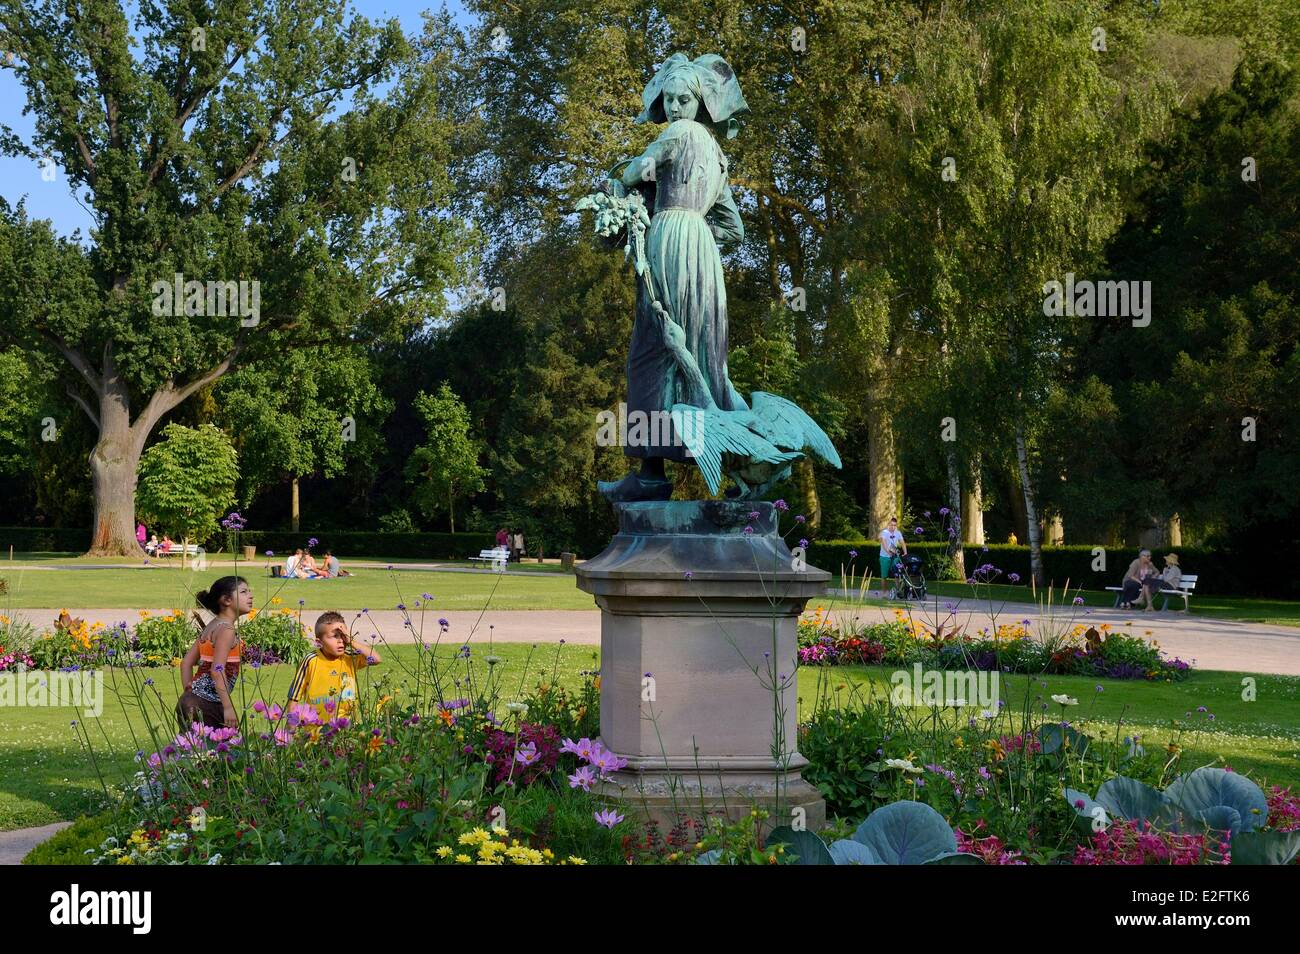 France Bas Rhin Strasbourg Parc de l'Orangerie (Orangery Park) bronze statue of Ganseliesel (Elisabeth accompanied - Stock Image